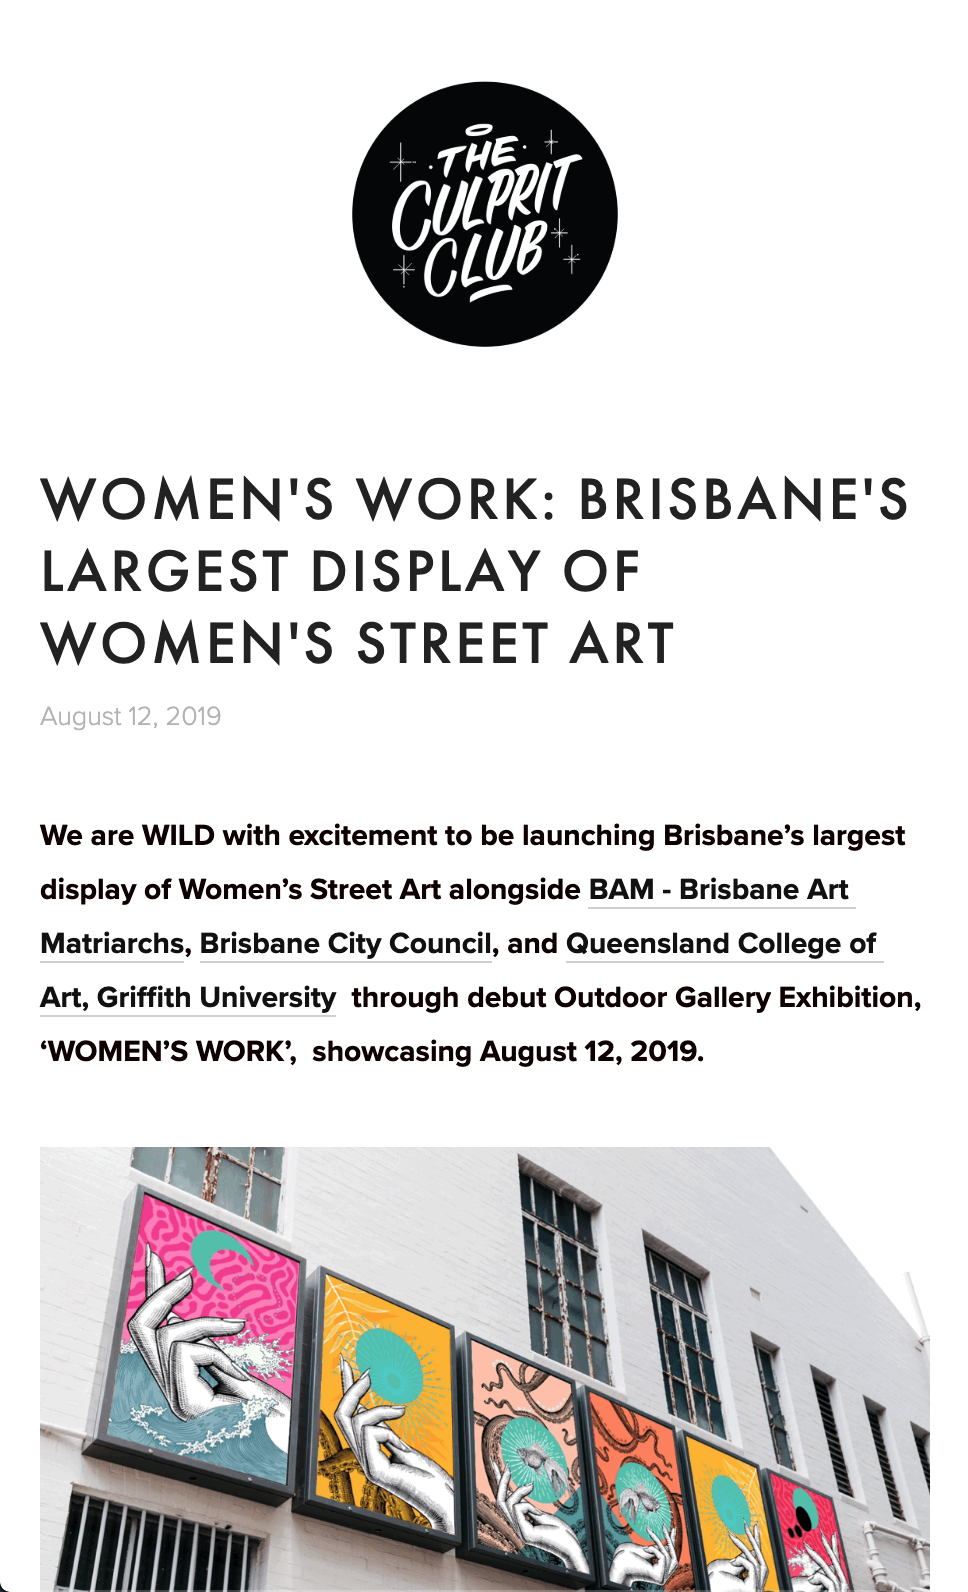 TheCulpritClub-Brisbane-WomensWork-Mosessa.png